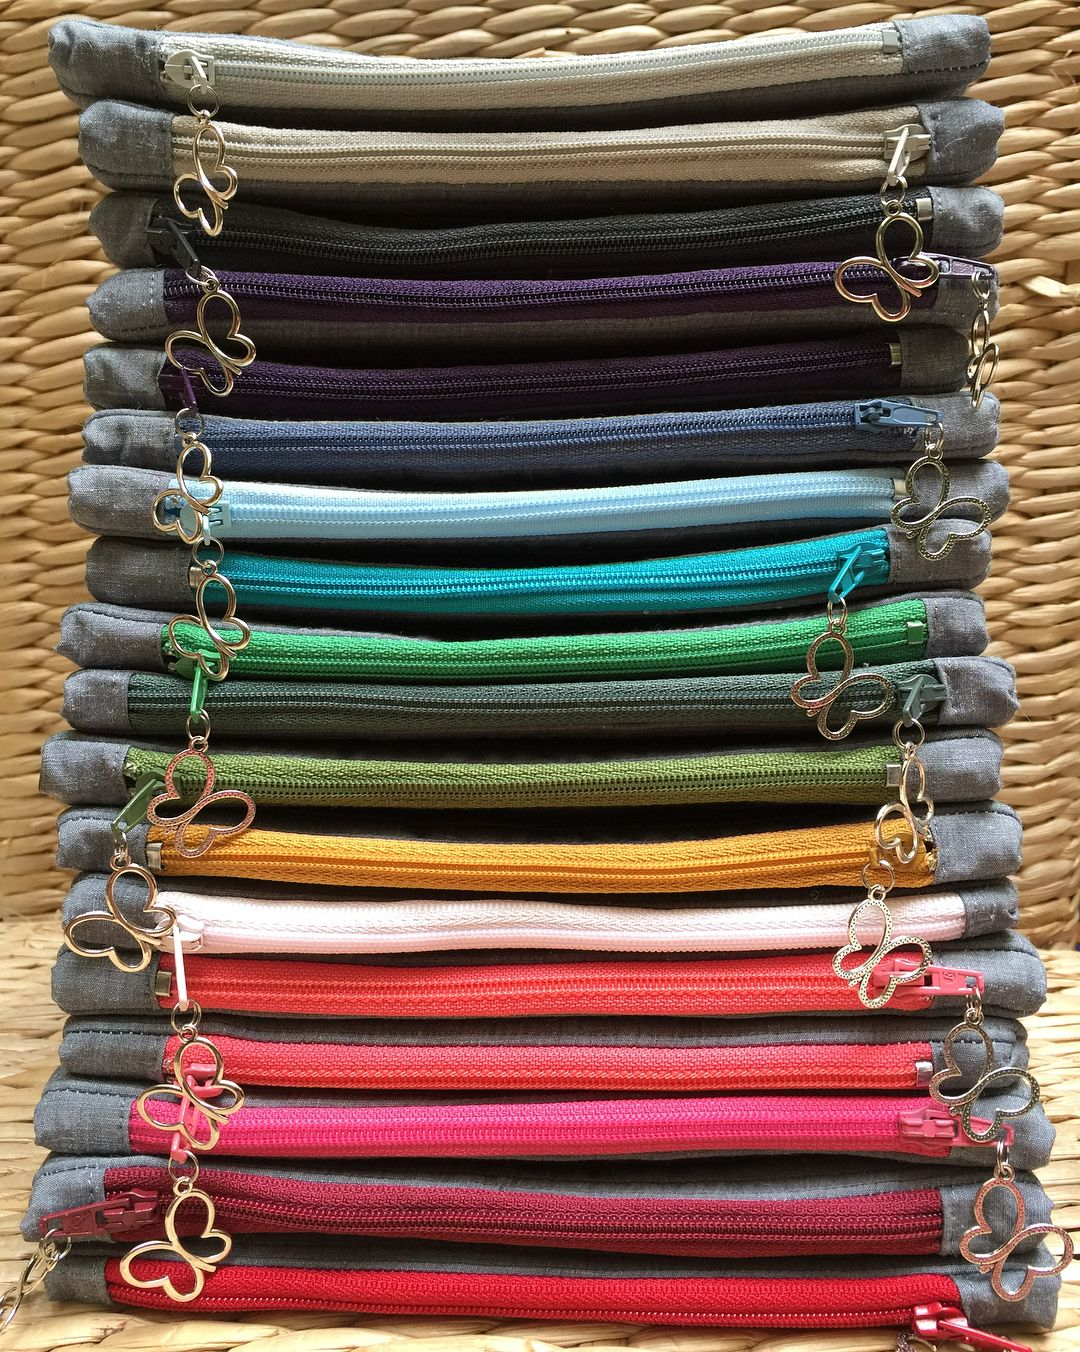 Finishing touches 🦋 #zipperpouch #zipper #rainbow #butterfly #shechasesbutterflies #handmade #handsewn #supportlocal #buyhandmade